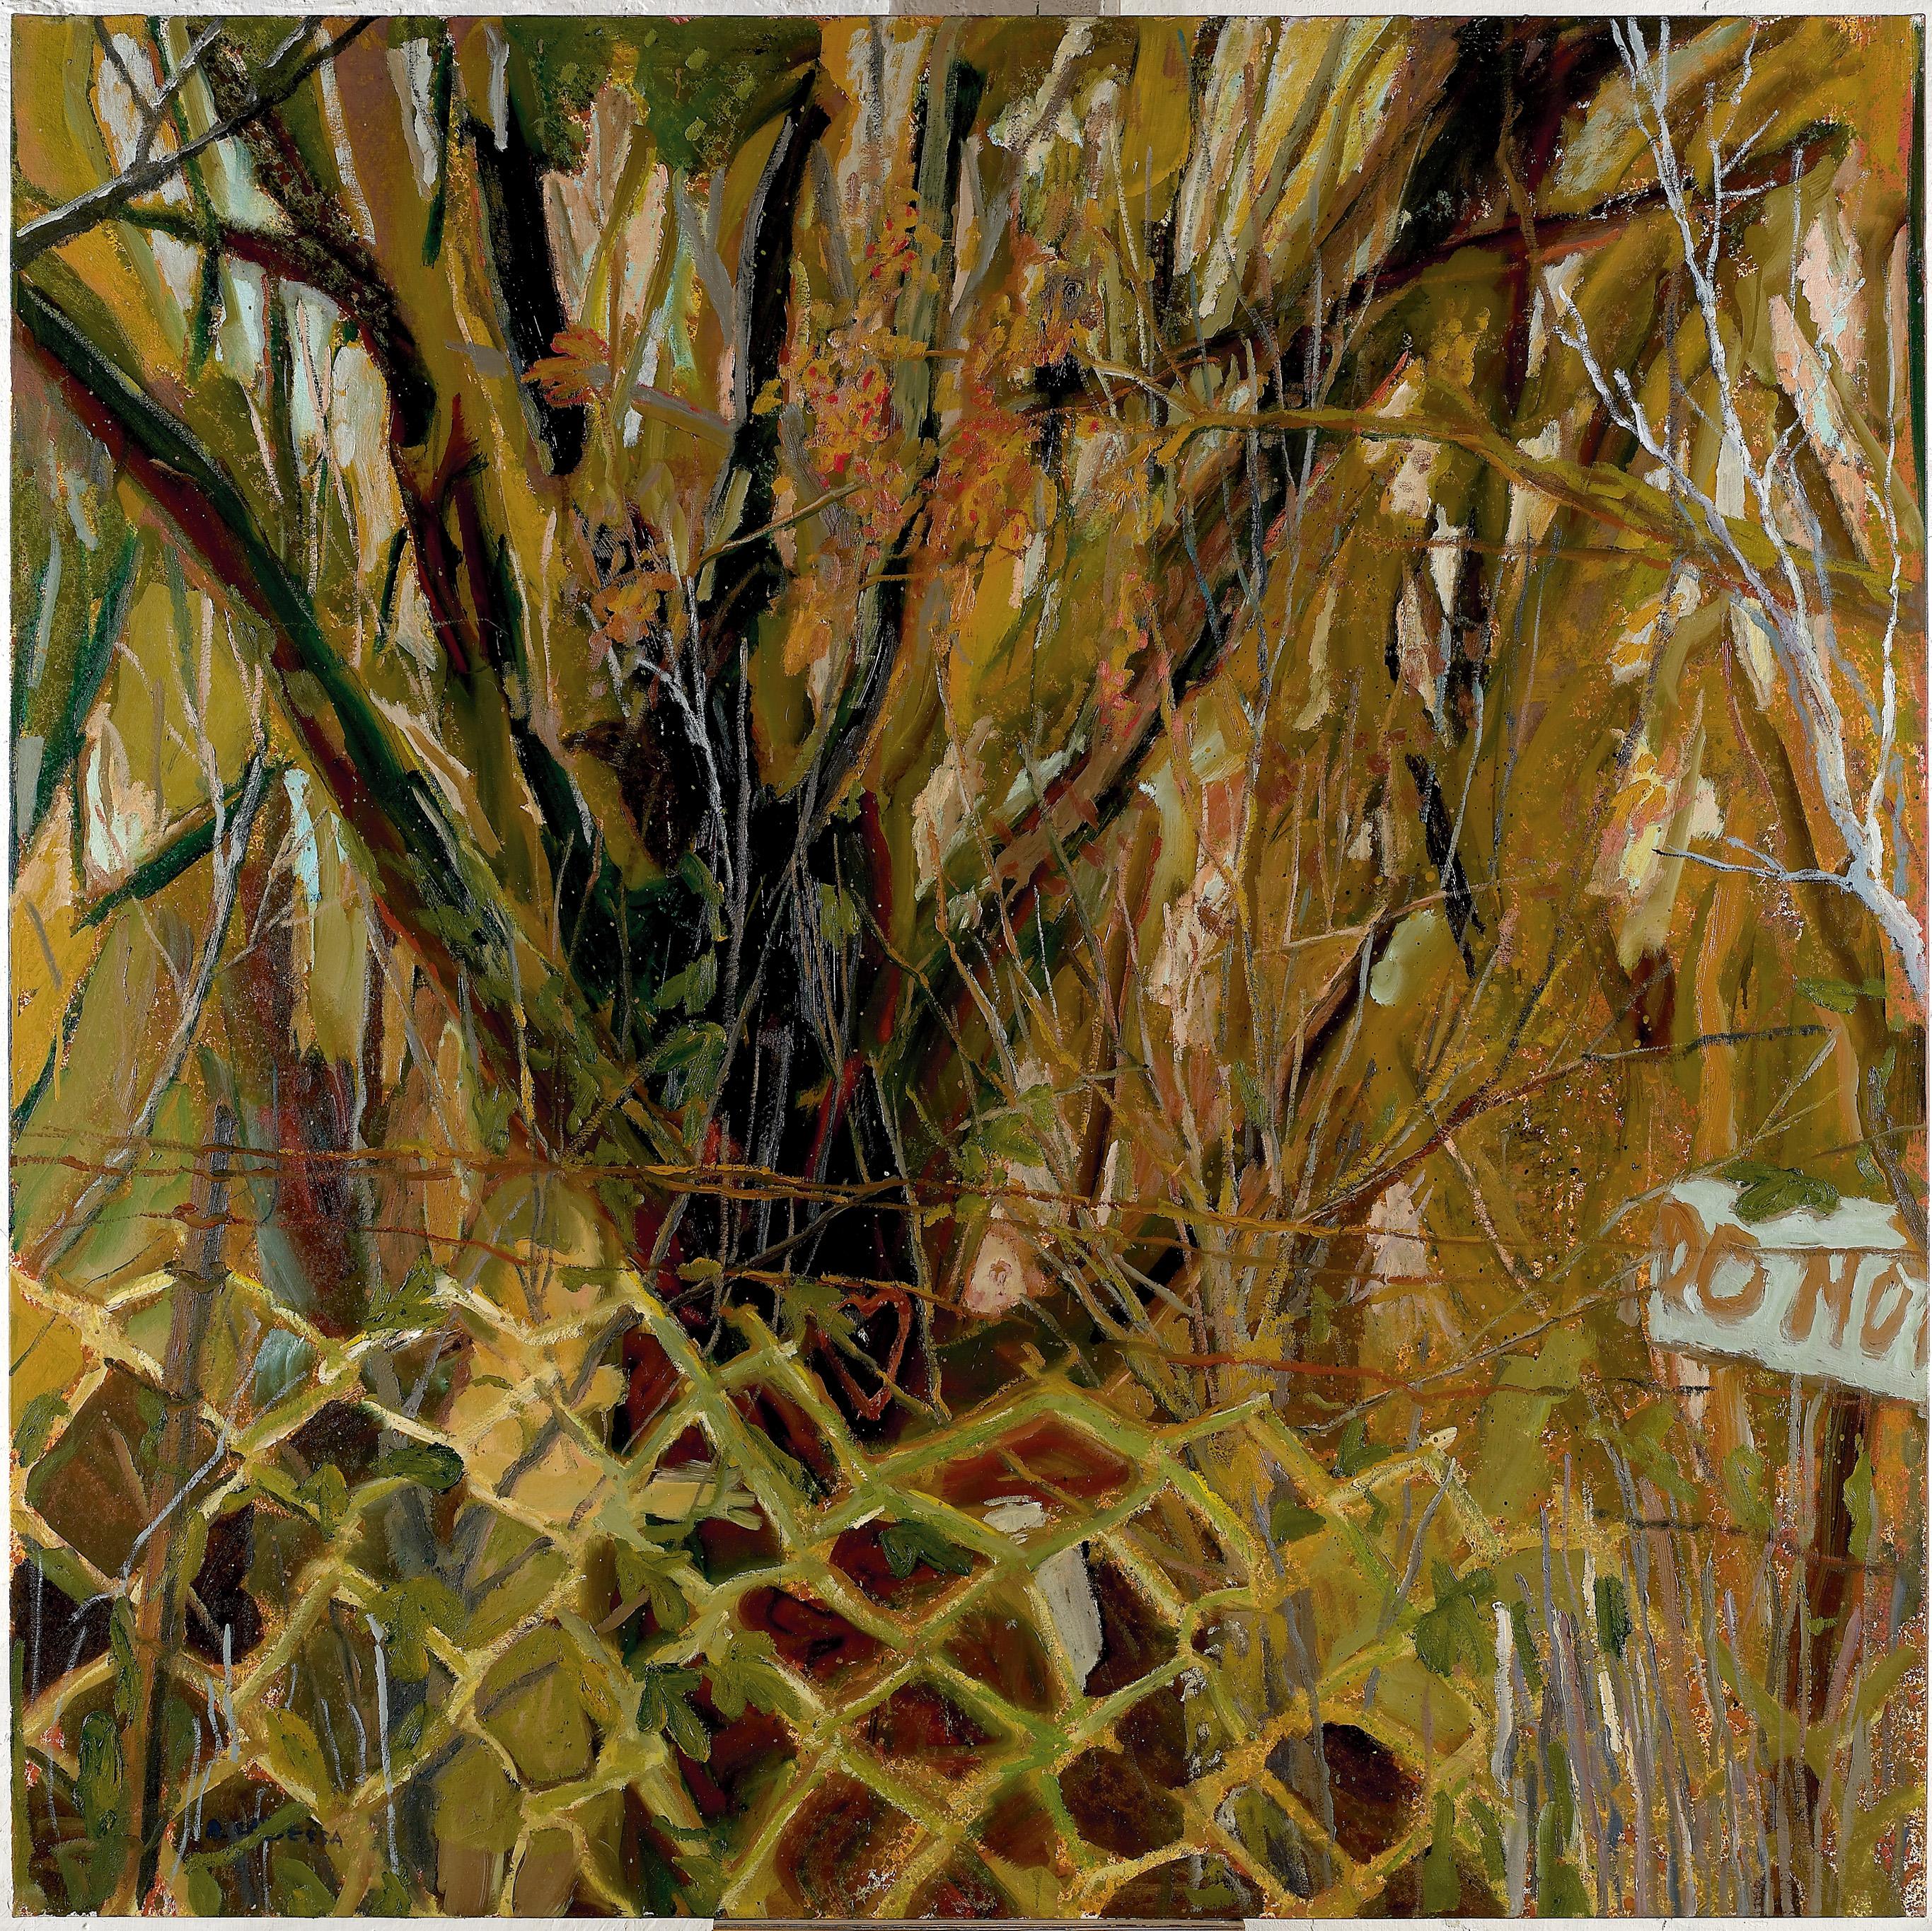 Amit Cabessa, Man, Woman and Tree, 2010, Oil on Canvas, 170x170cm, $14,000